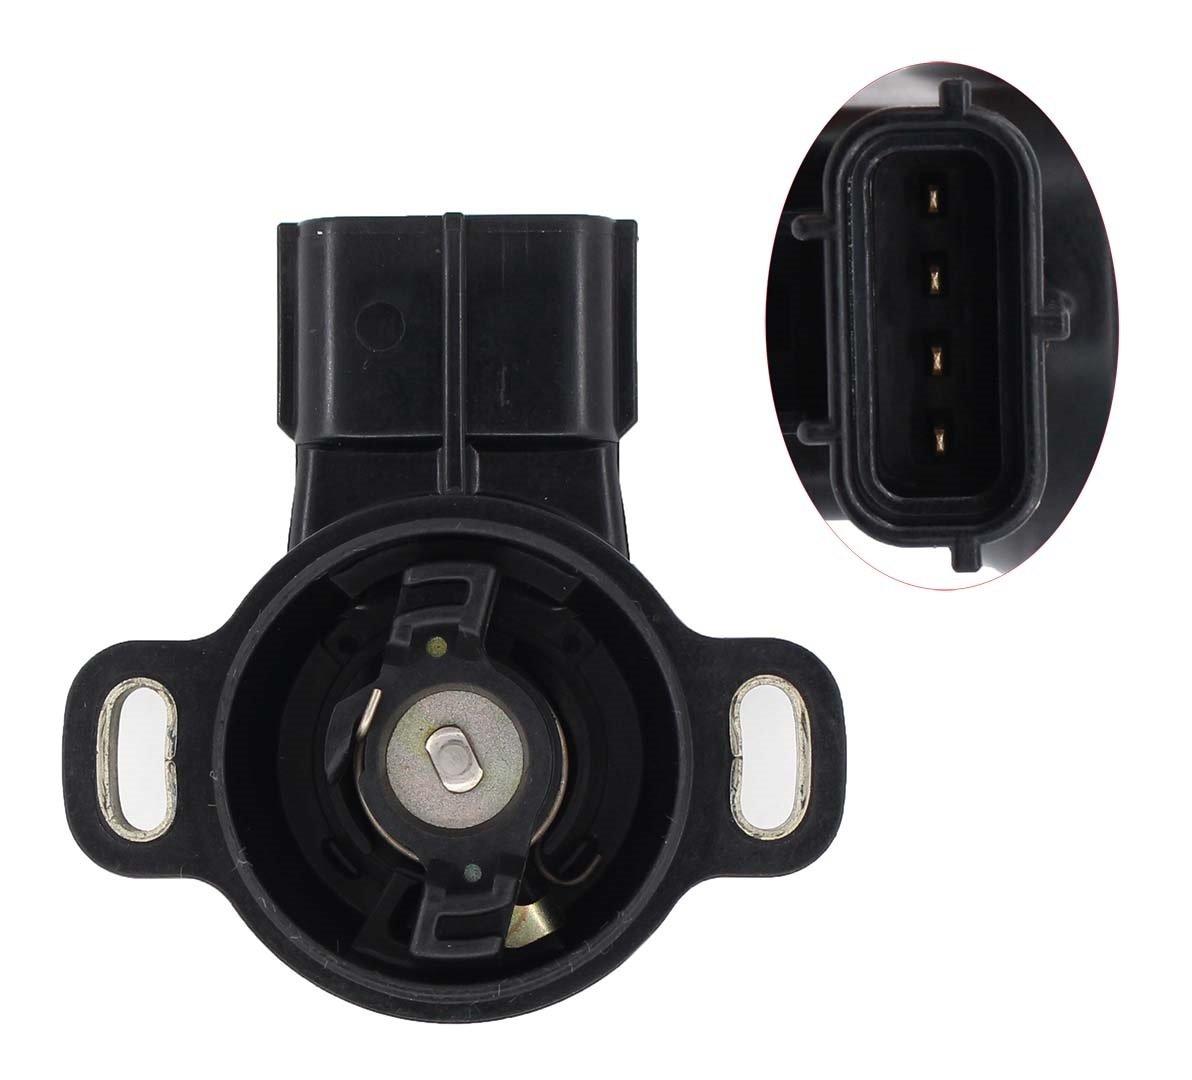 Throttle Position Sensor TPS For Toyota 4Runner Supra T100 Tacoma Lexus Toyota Land Cruiser Sequoia Tundra Replaces # 89452-30140 89452-22080